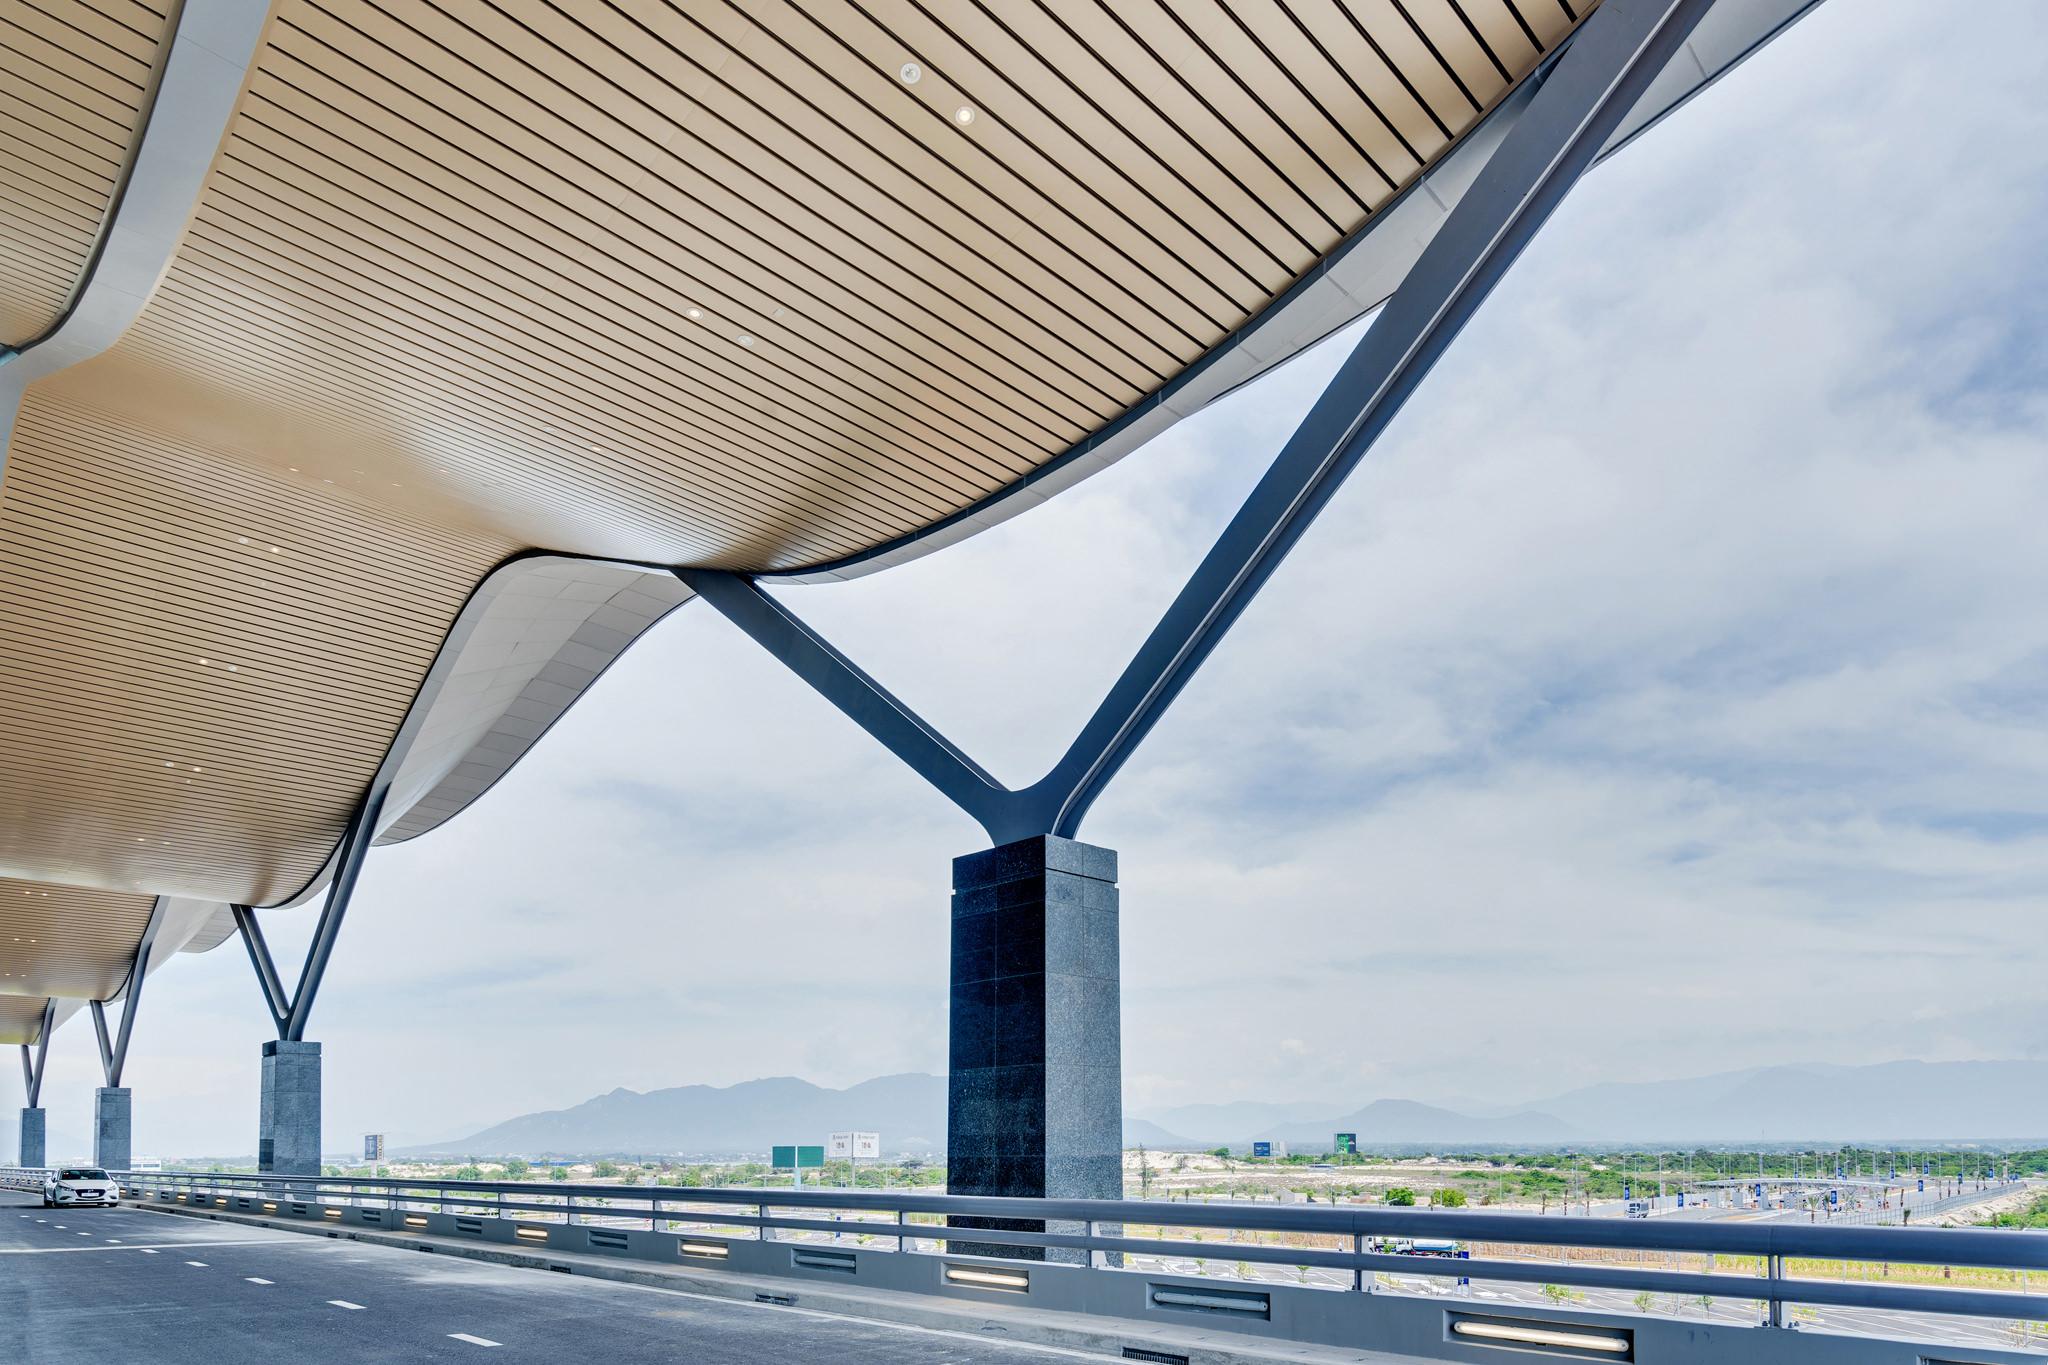 20180626 - Cam Ranh Airport - Architecture - 0299.jpg